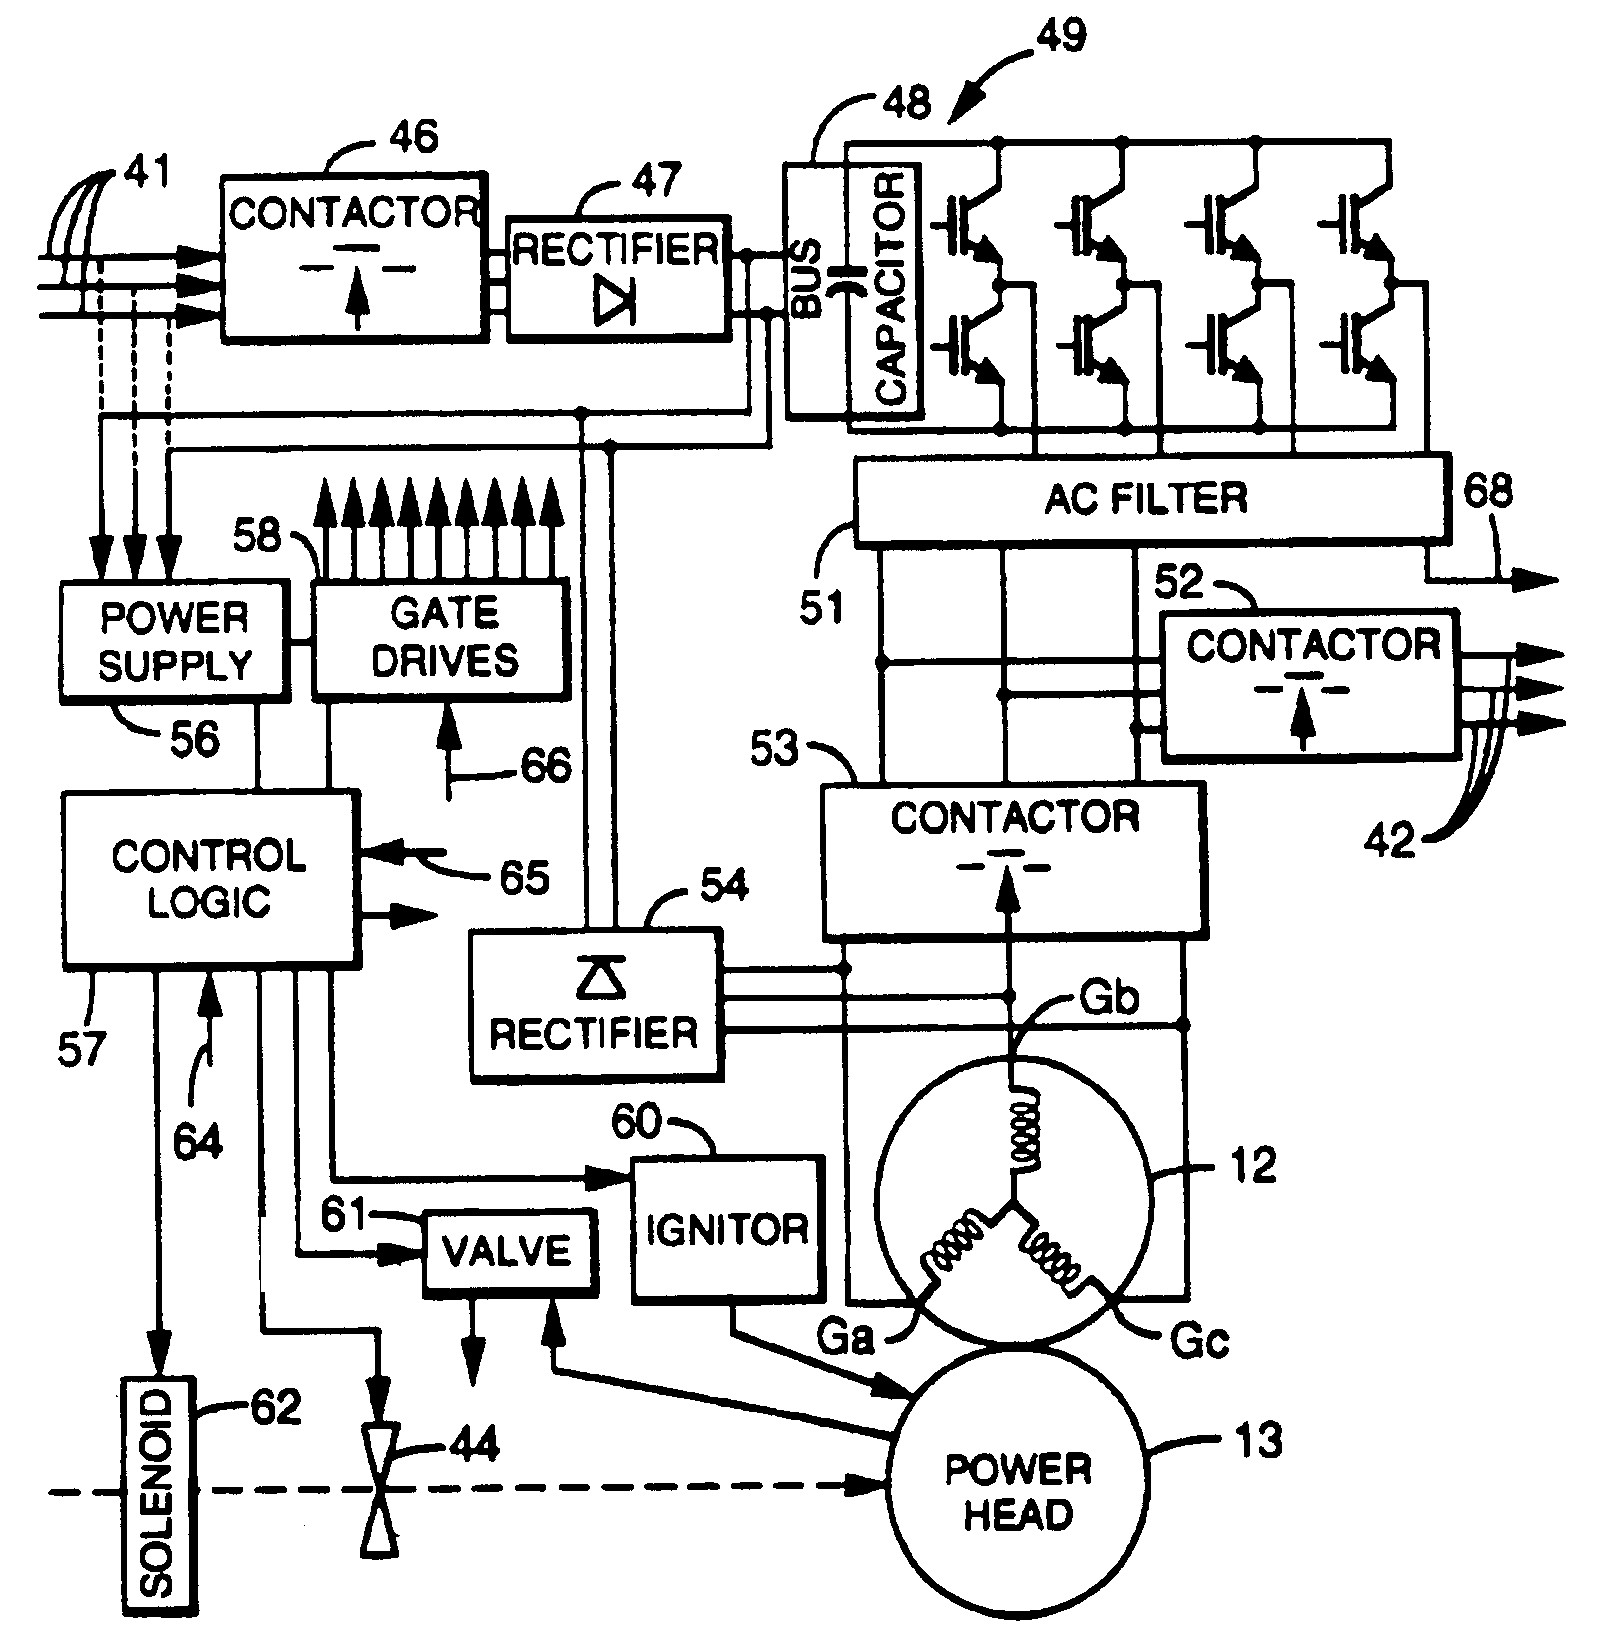 USRE040713 20090519 D00000 magneti marelli alternator wiring diagram delco alternator wiring magneti marelli alternator wiring diagram at et-consult.org